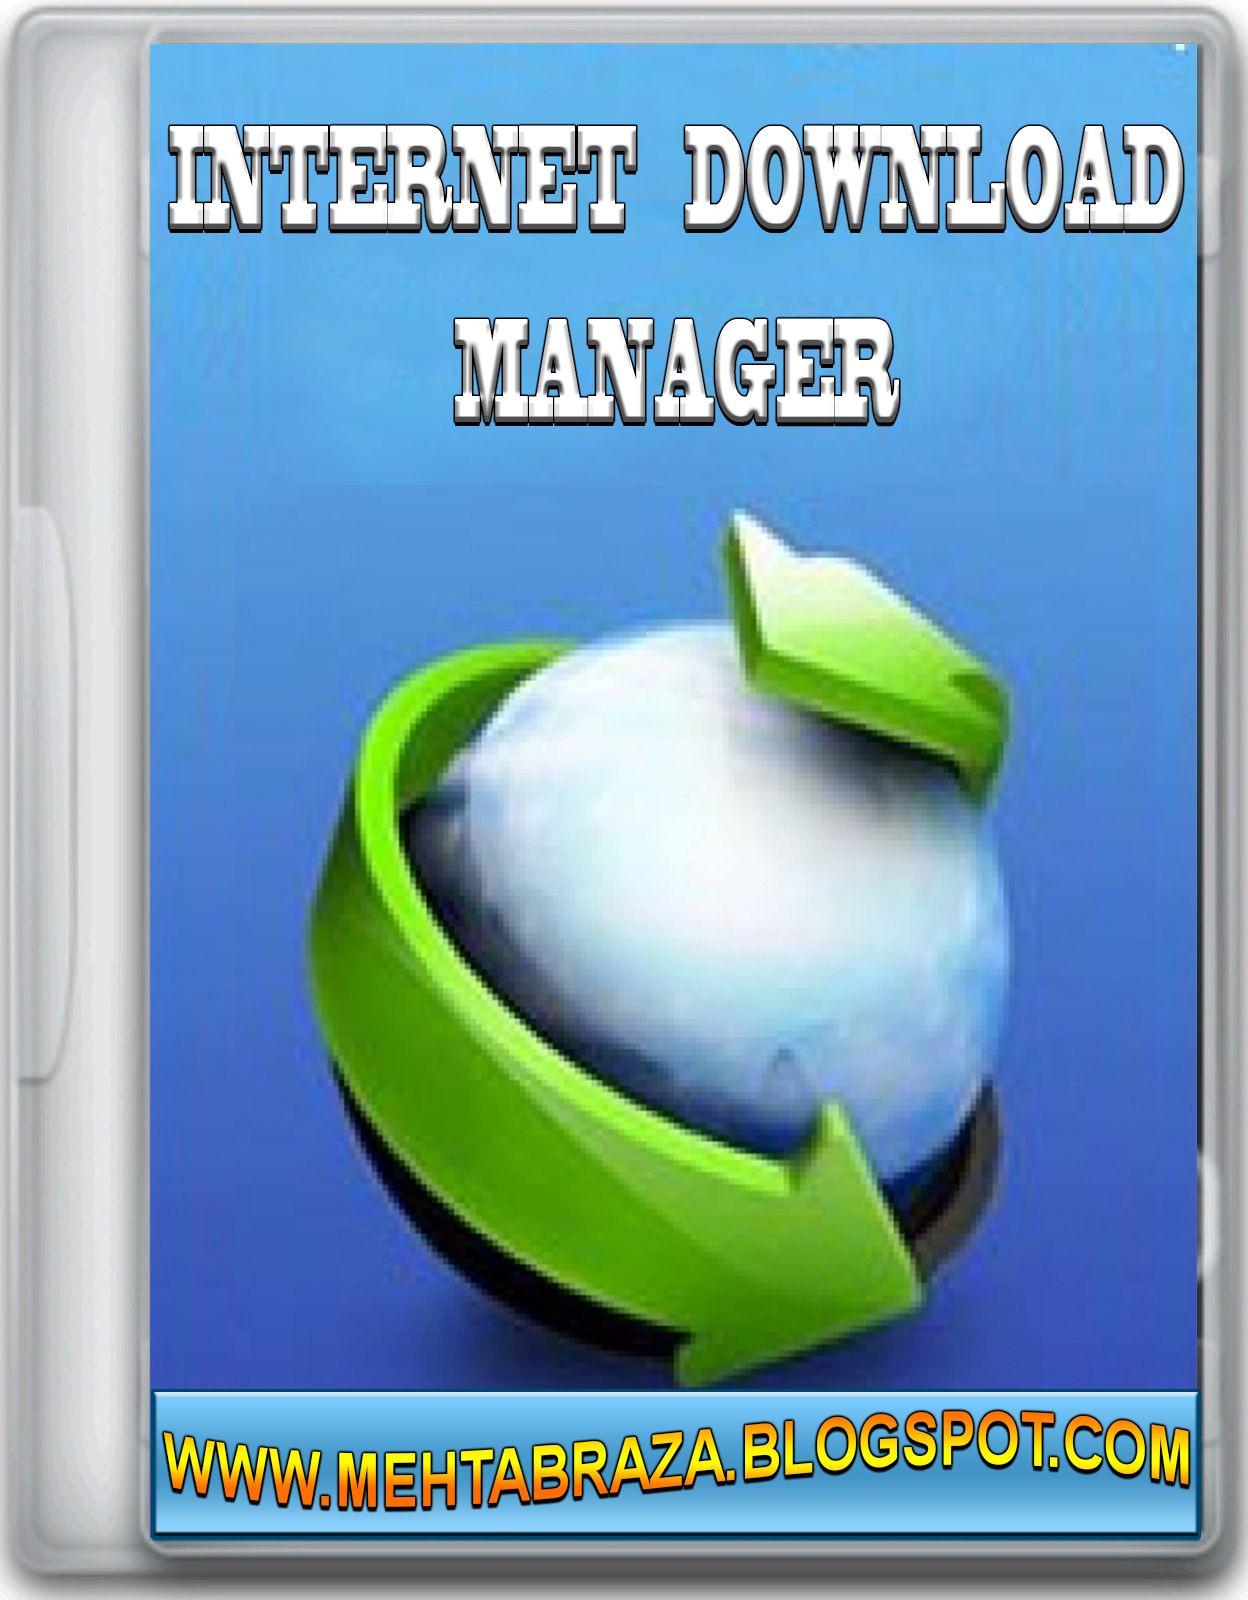 OFFICIAL SOFTWARE OF INTERNET DOWNLOAD MANAGER FULL VERSION Internet